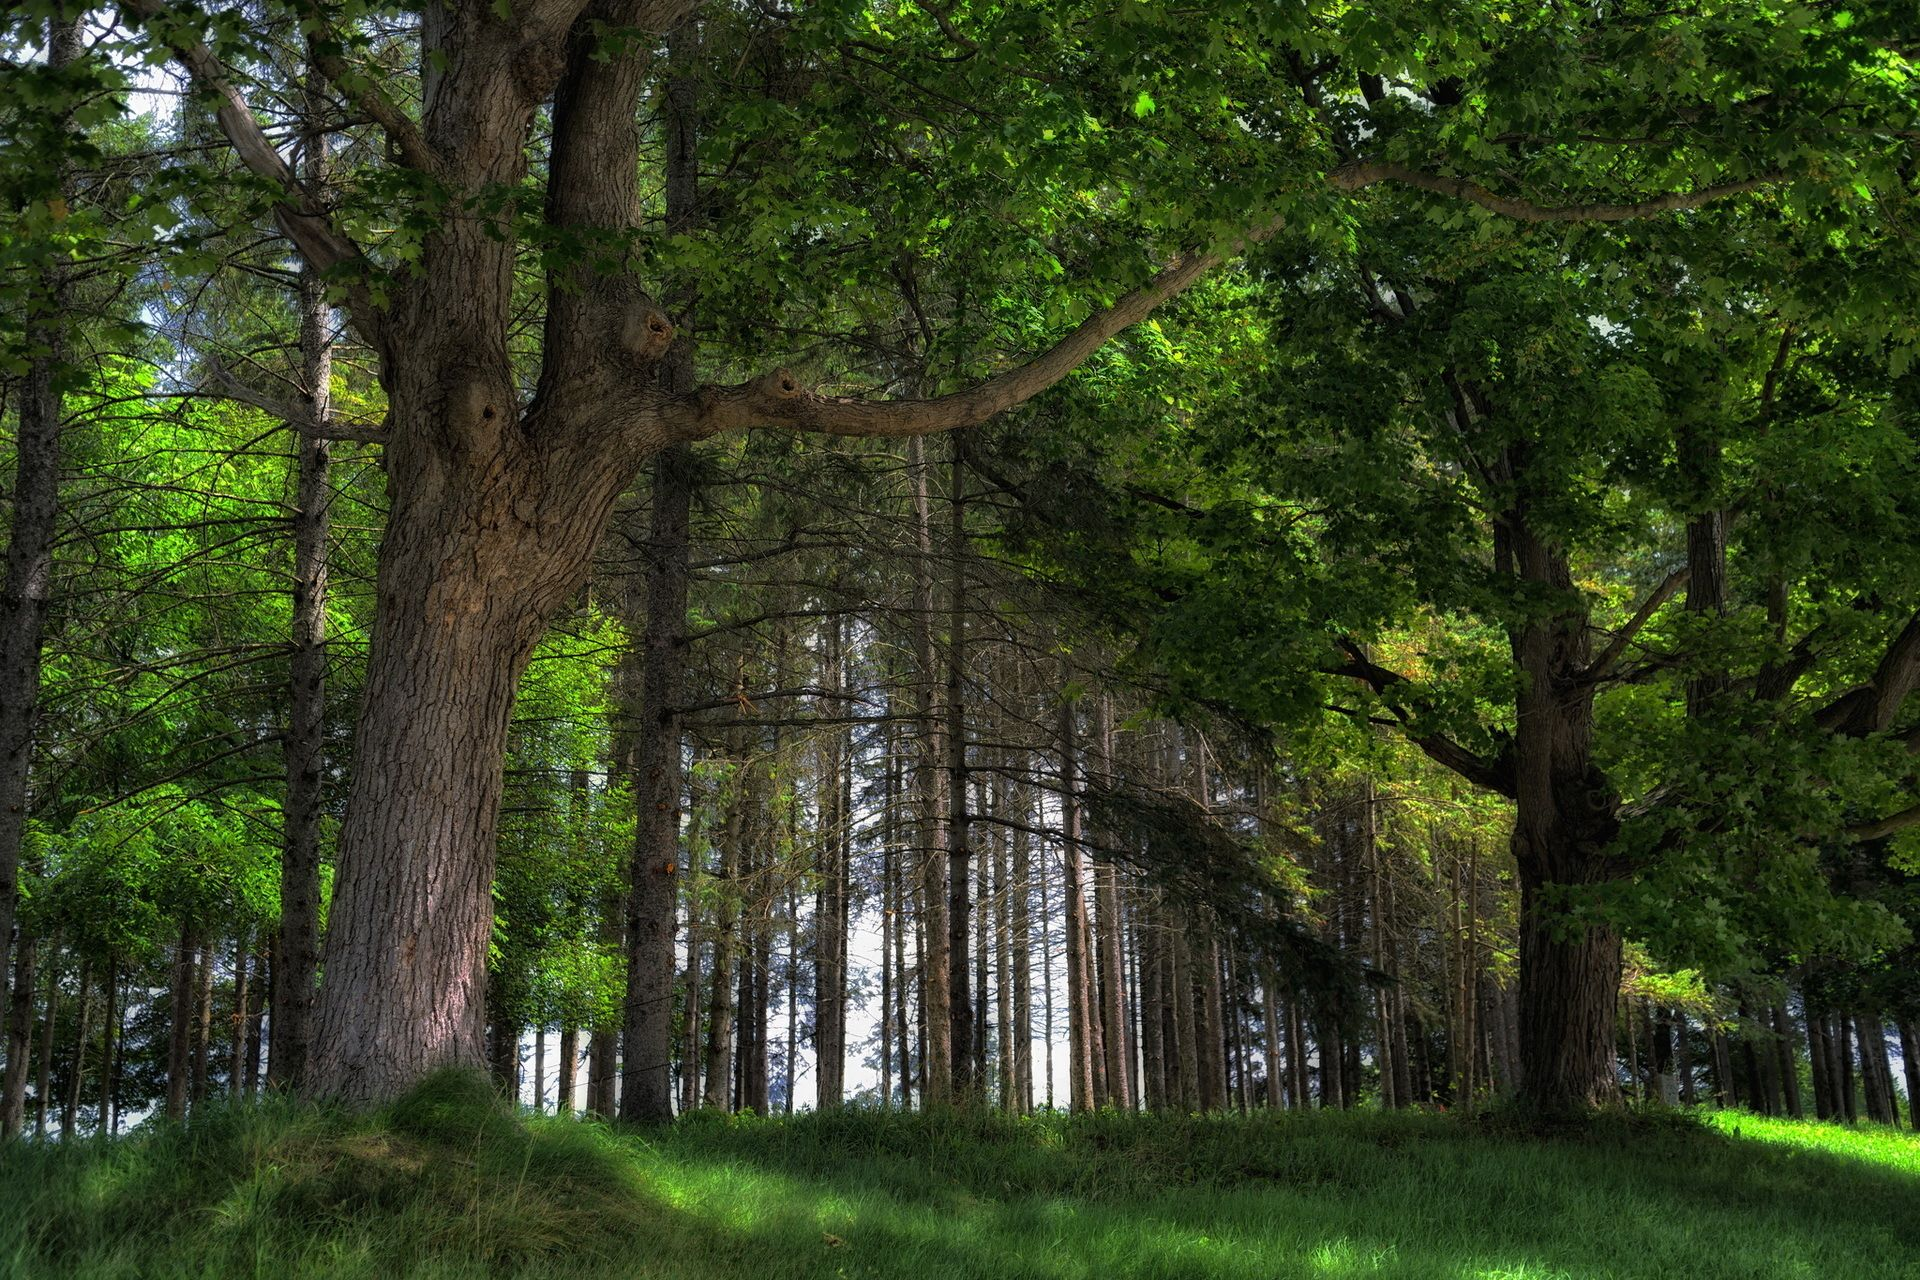 4k wallpaper nature redwoods - photo #23